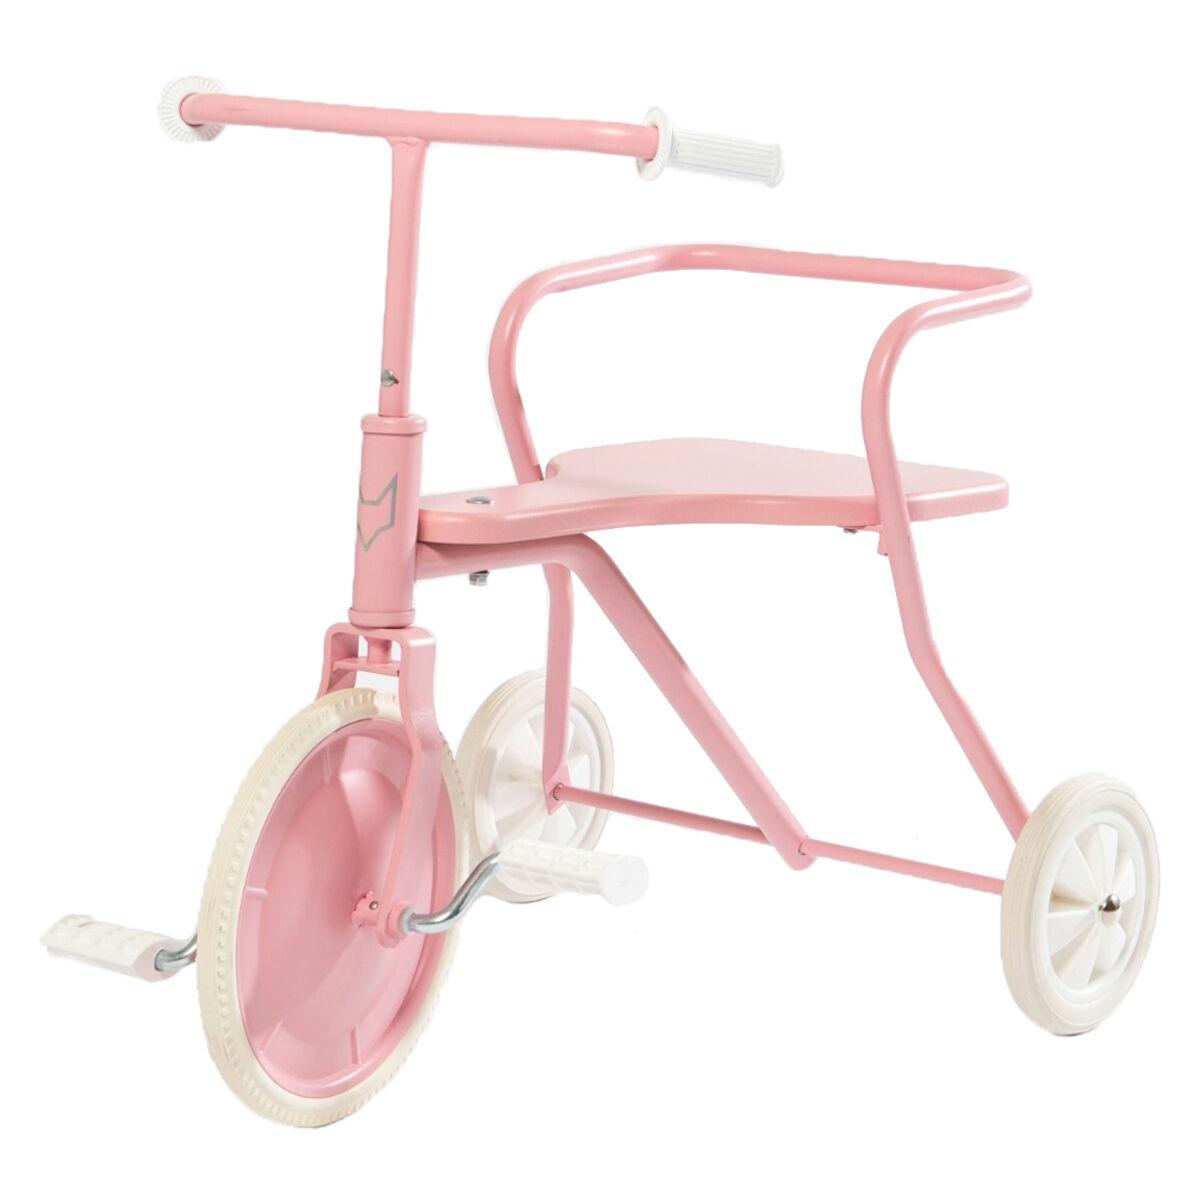 Fox Rider Tricycle en Métal - Rose Vintage